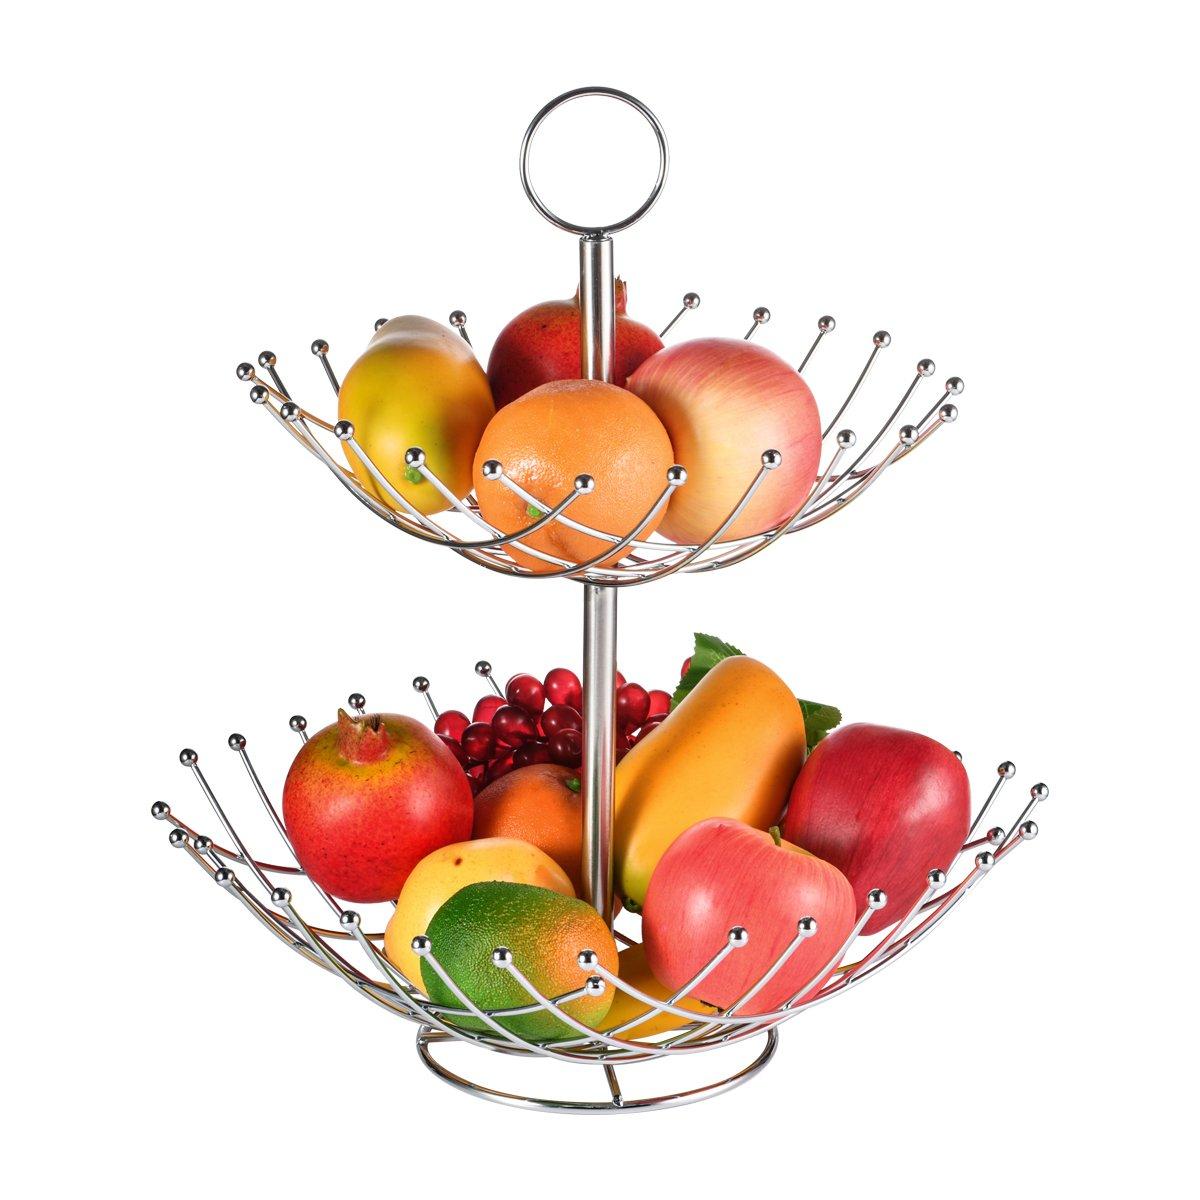 SHMEIQI 2段 カウンタートップ フルーツバスケットホルダー & ボウルスタンド - フルーツ、野菜、スナック、パン用ディスプレイトレイ - シルバー   B07FQJ3BK8